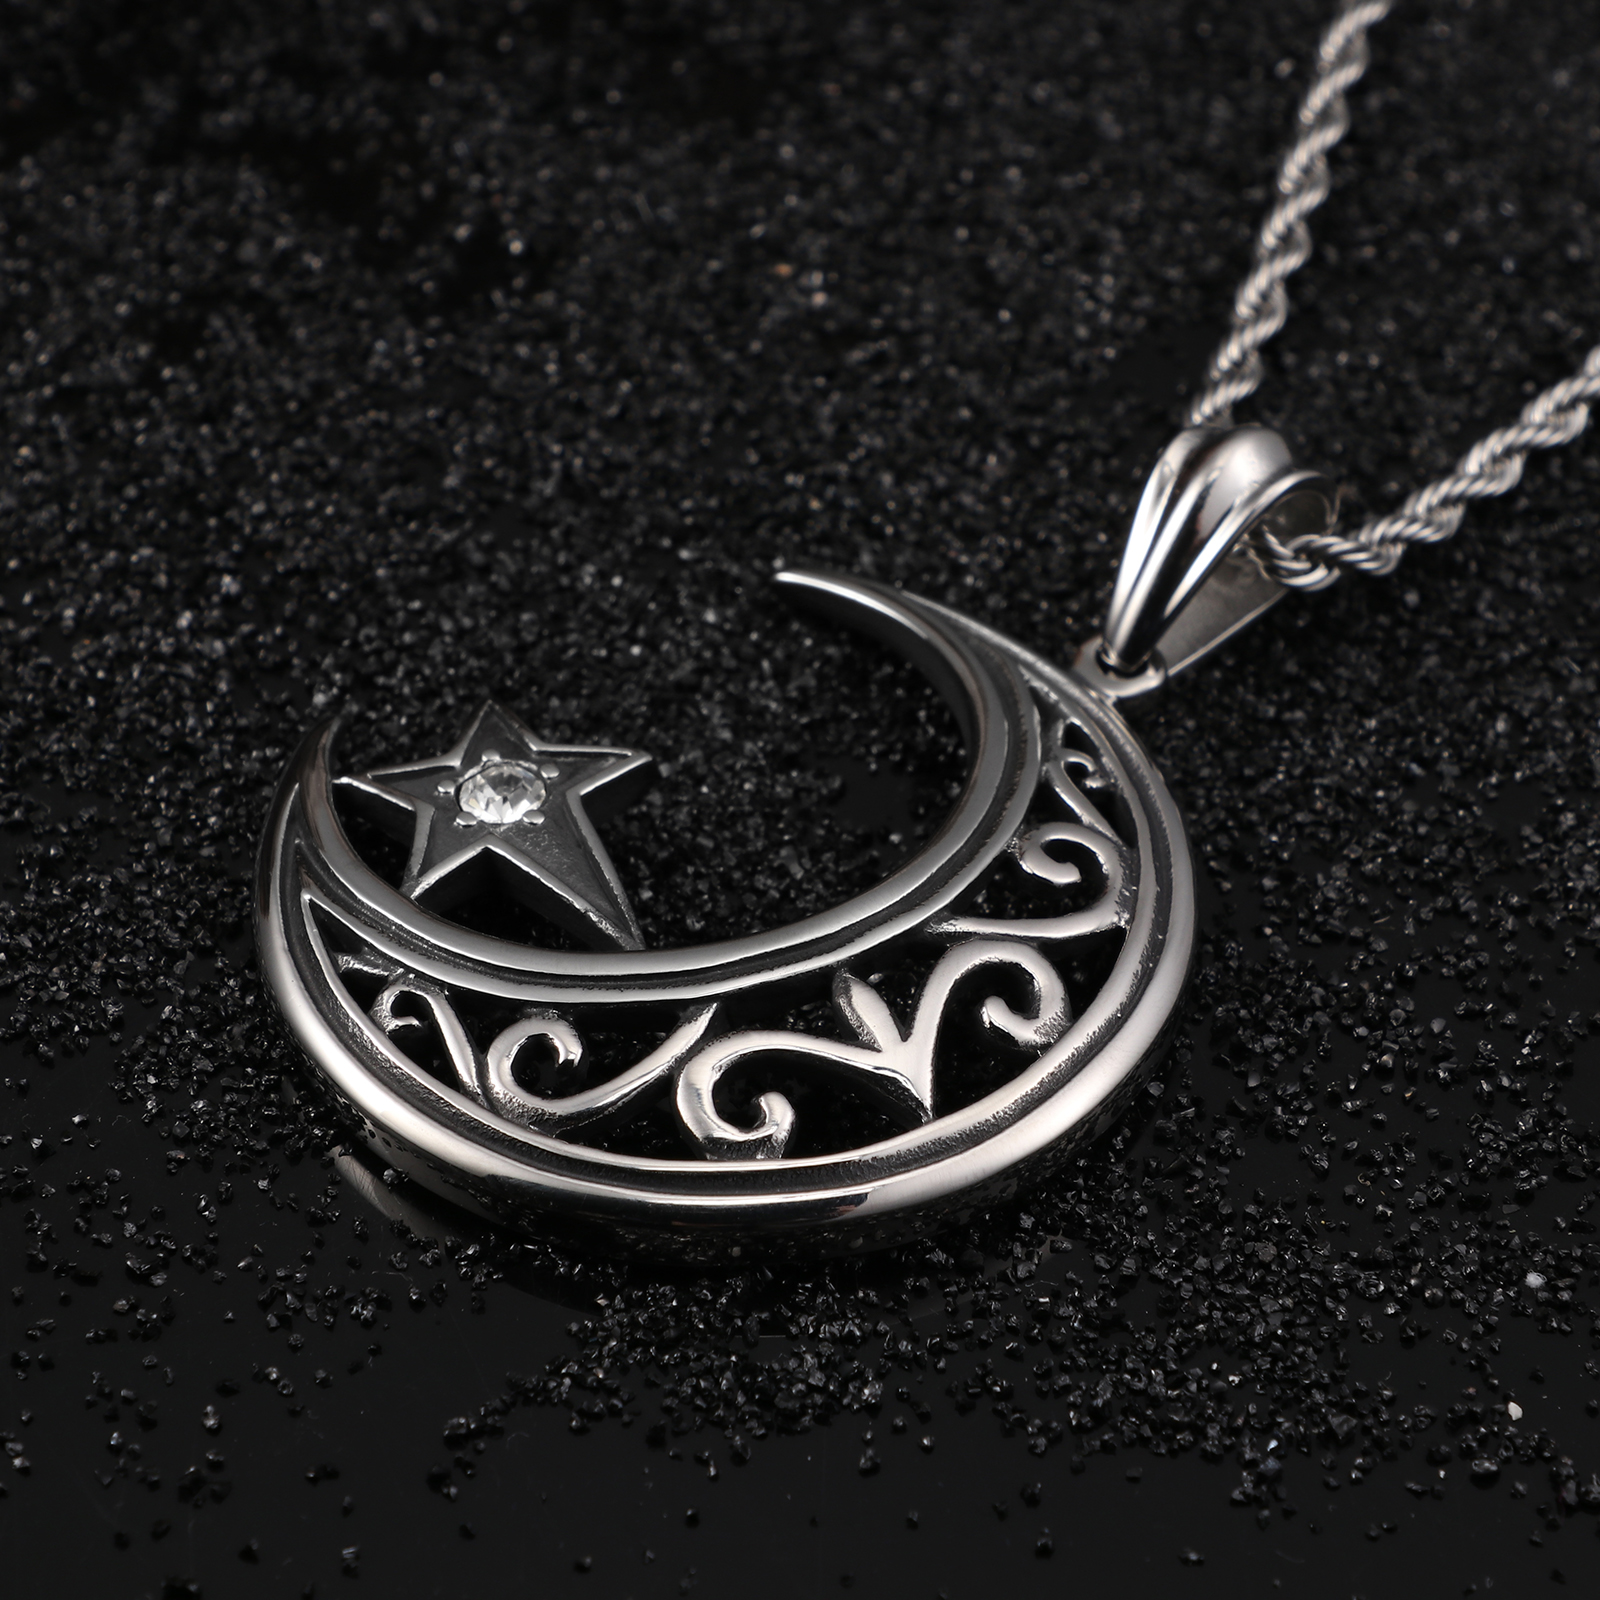 Fongten Islamic Charm Crescent Suspension Moon Pendant Necklace Stainless Steel Zircon Vintage Pendants Male Fashion Jewelry